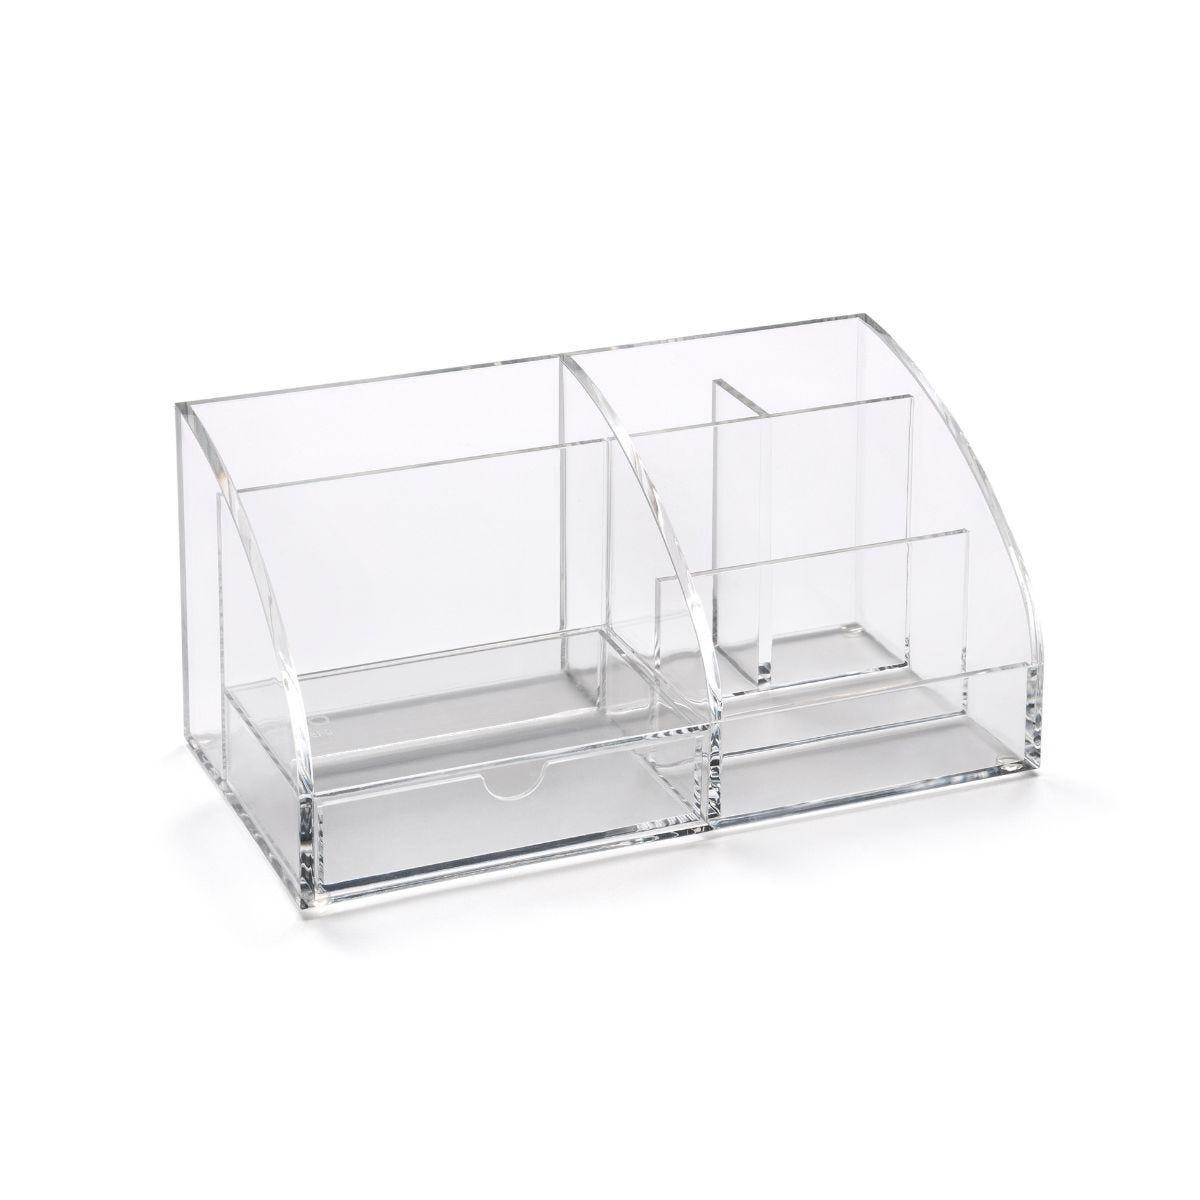 Osco Acrylic Desk Organiser